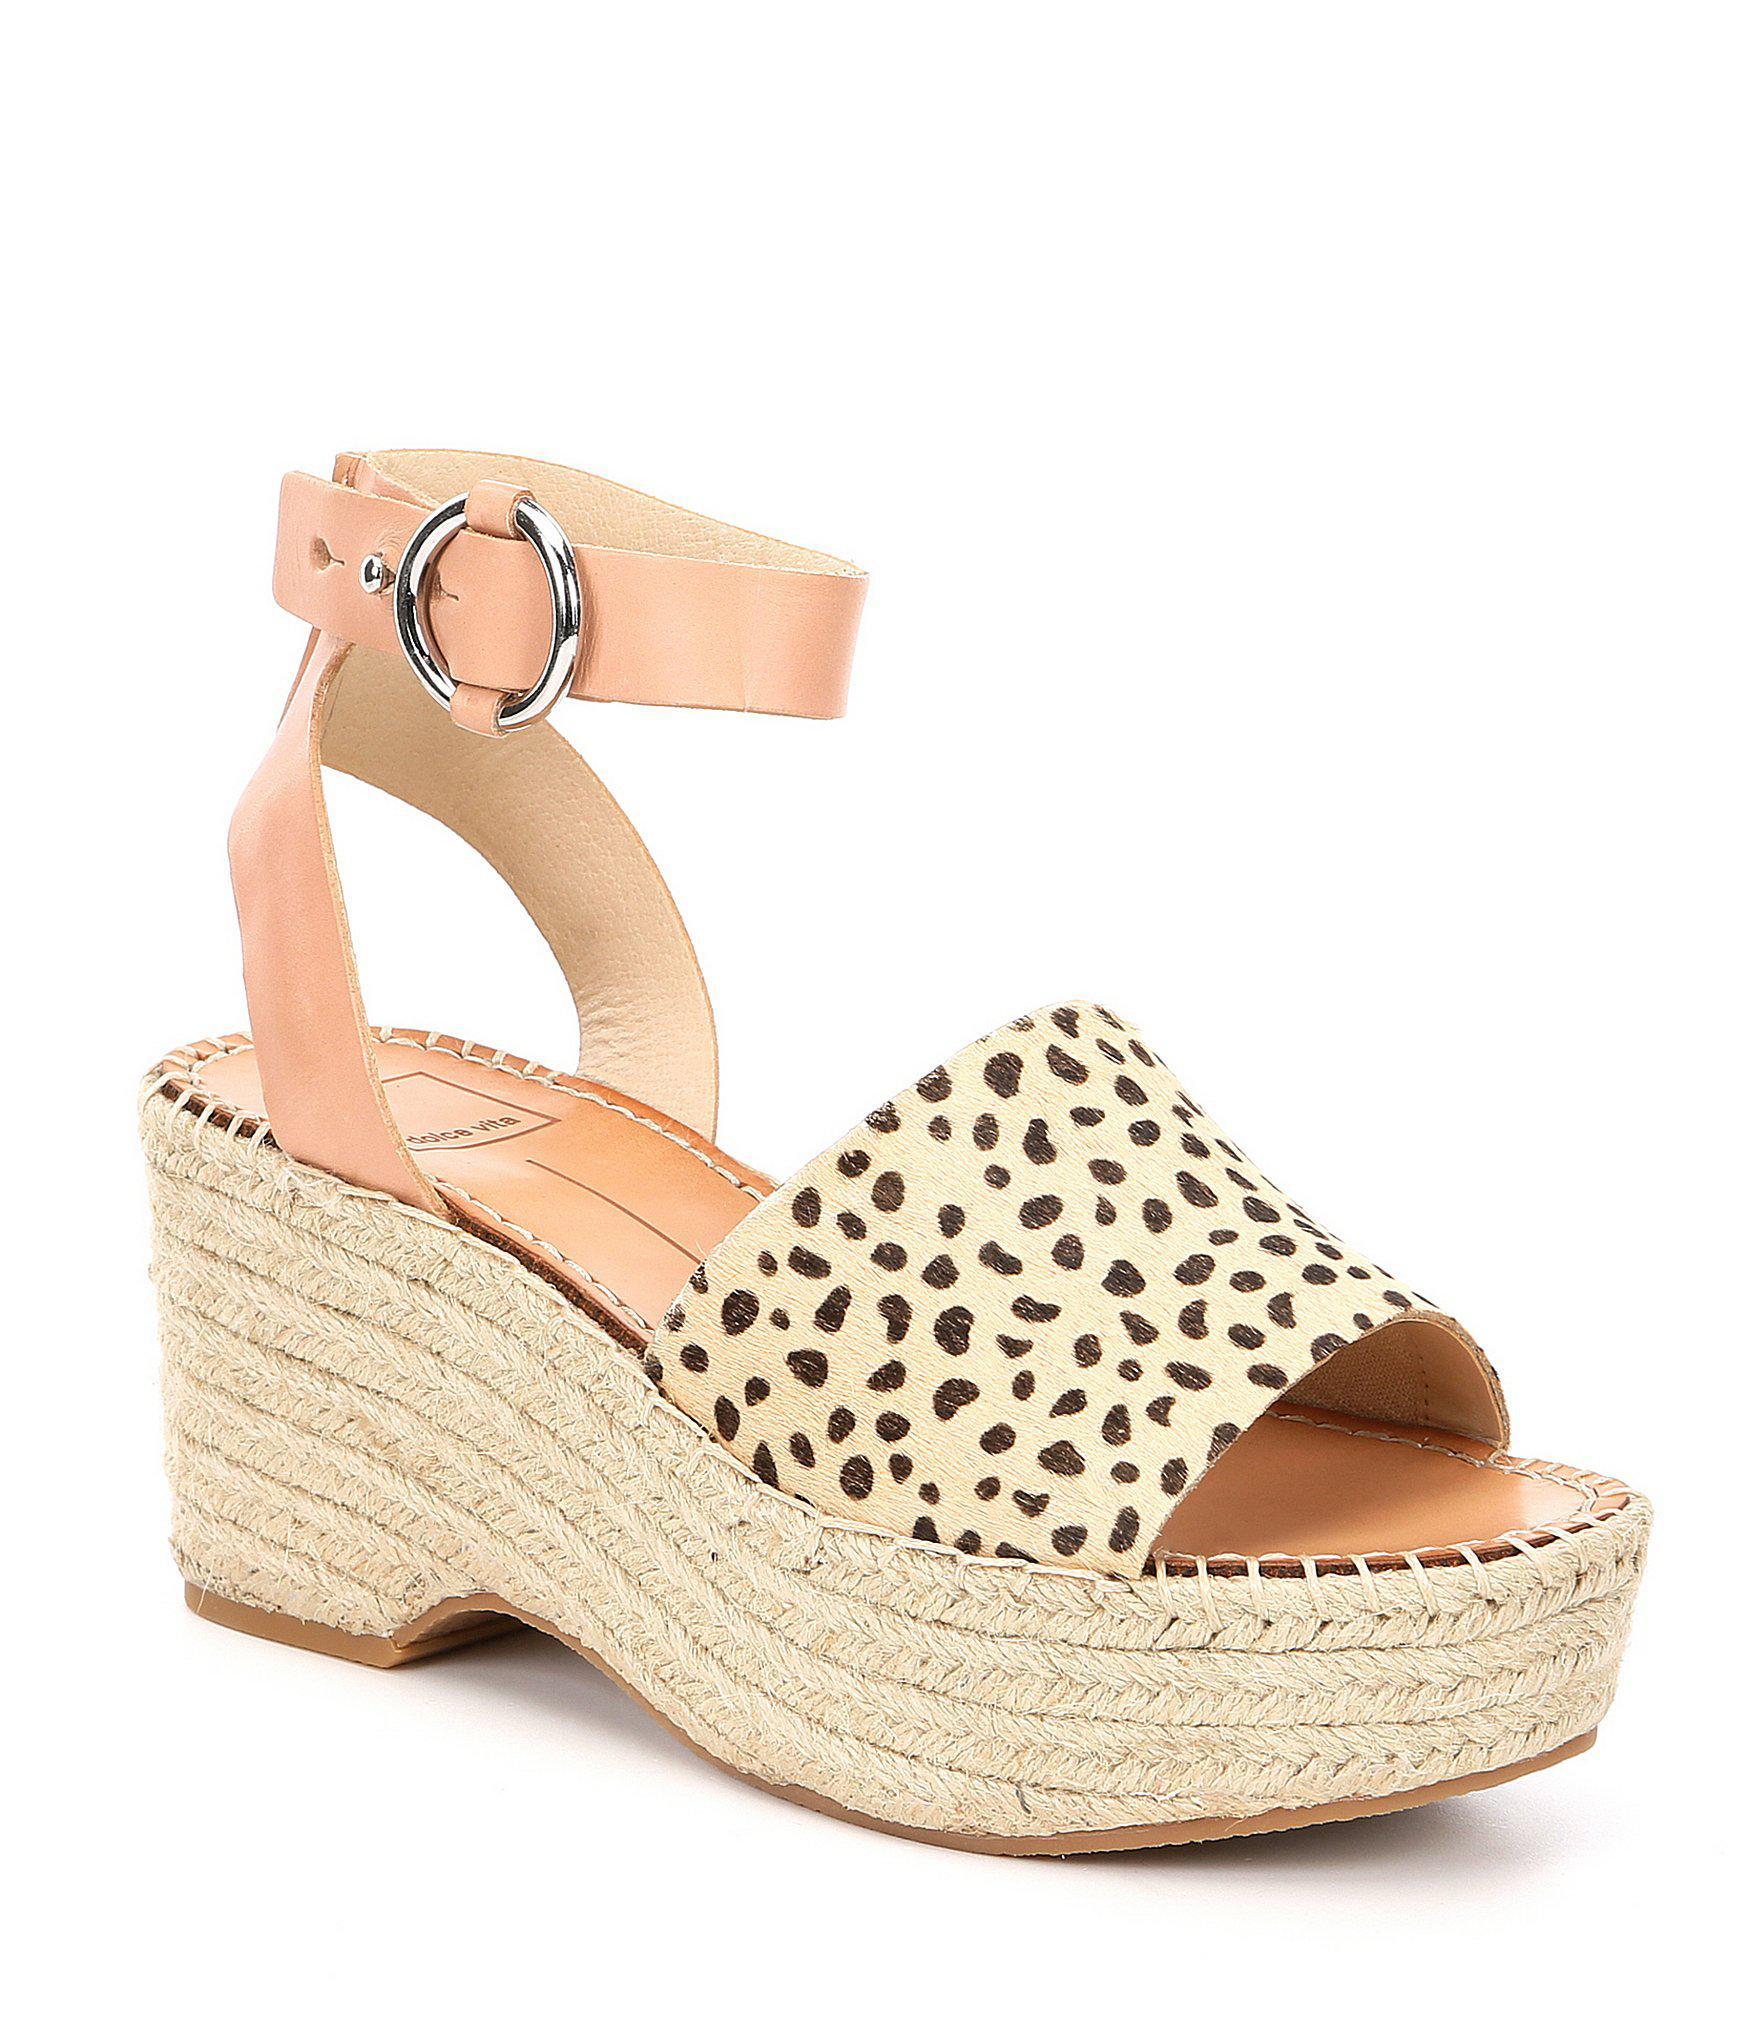 9cadaa9d1da Dolce Vita. Women s Lesly Leopard Print Calf Hair Platform Espadrille  Sandals